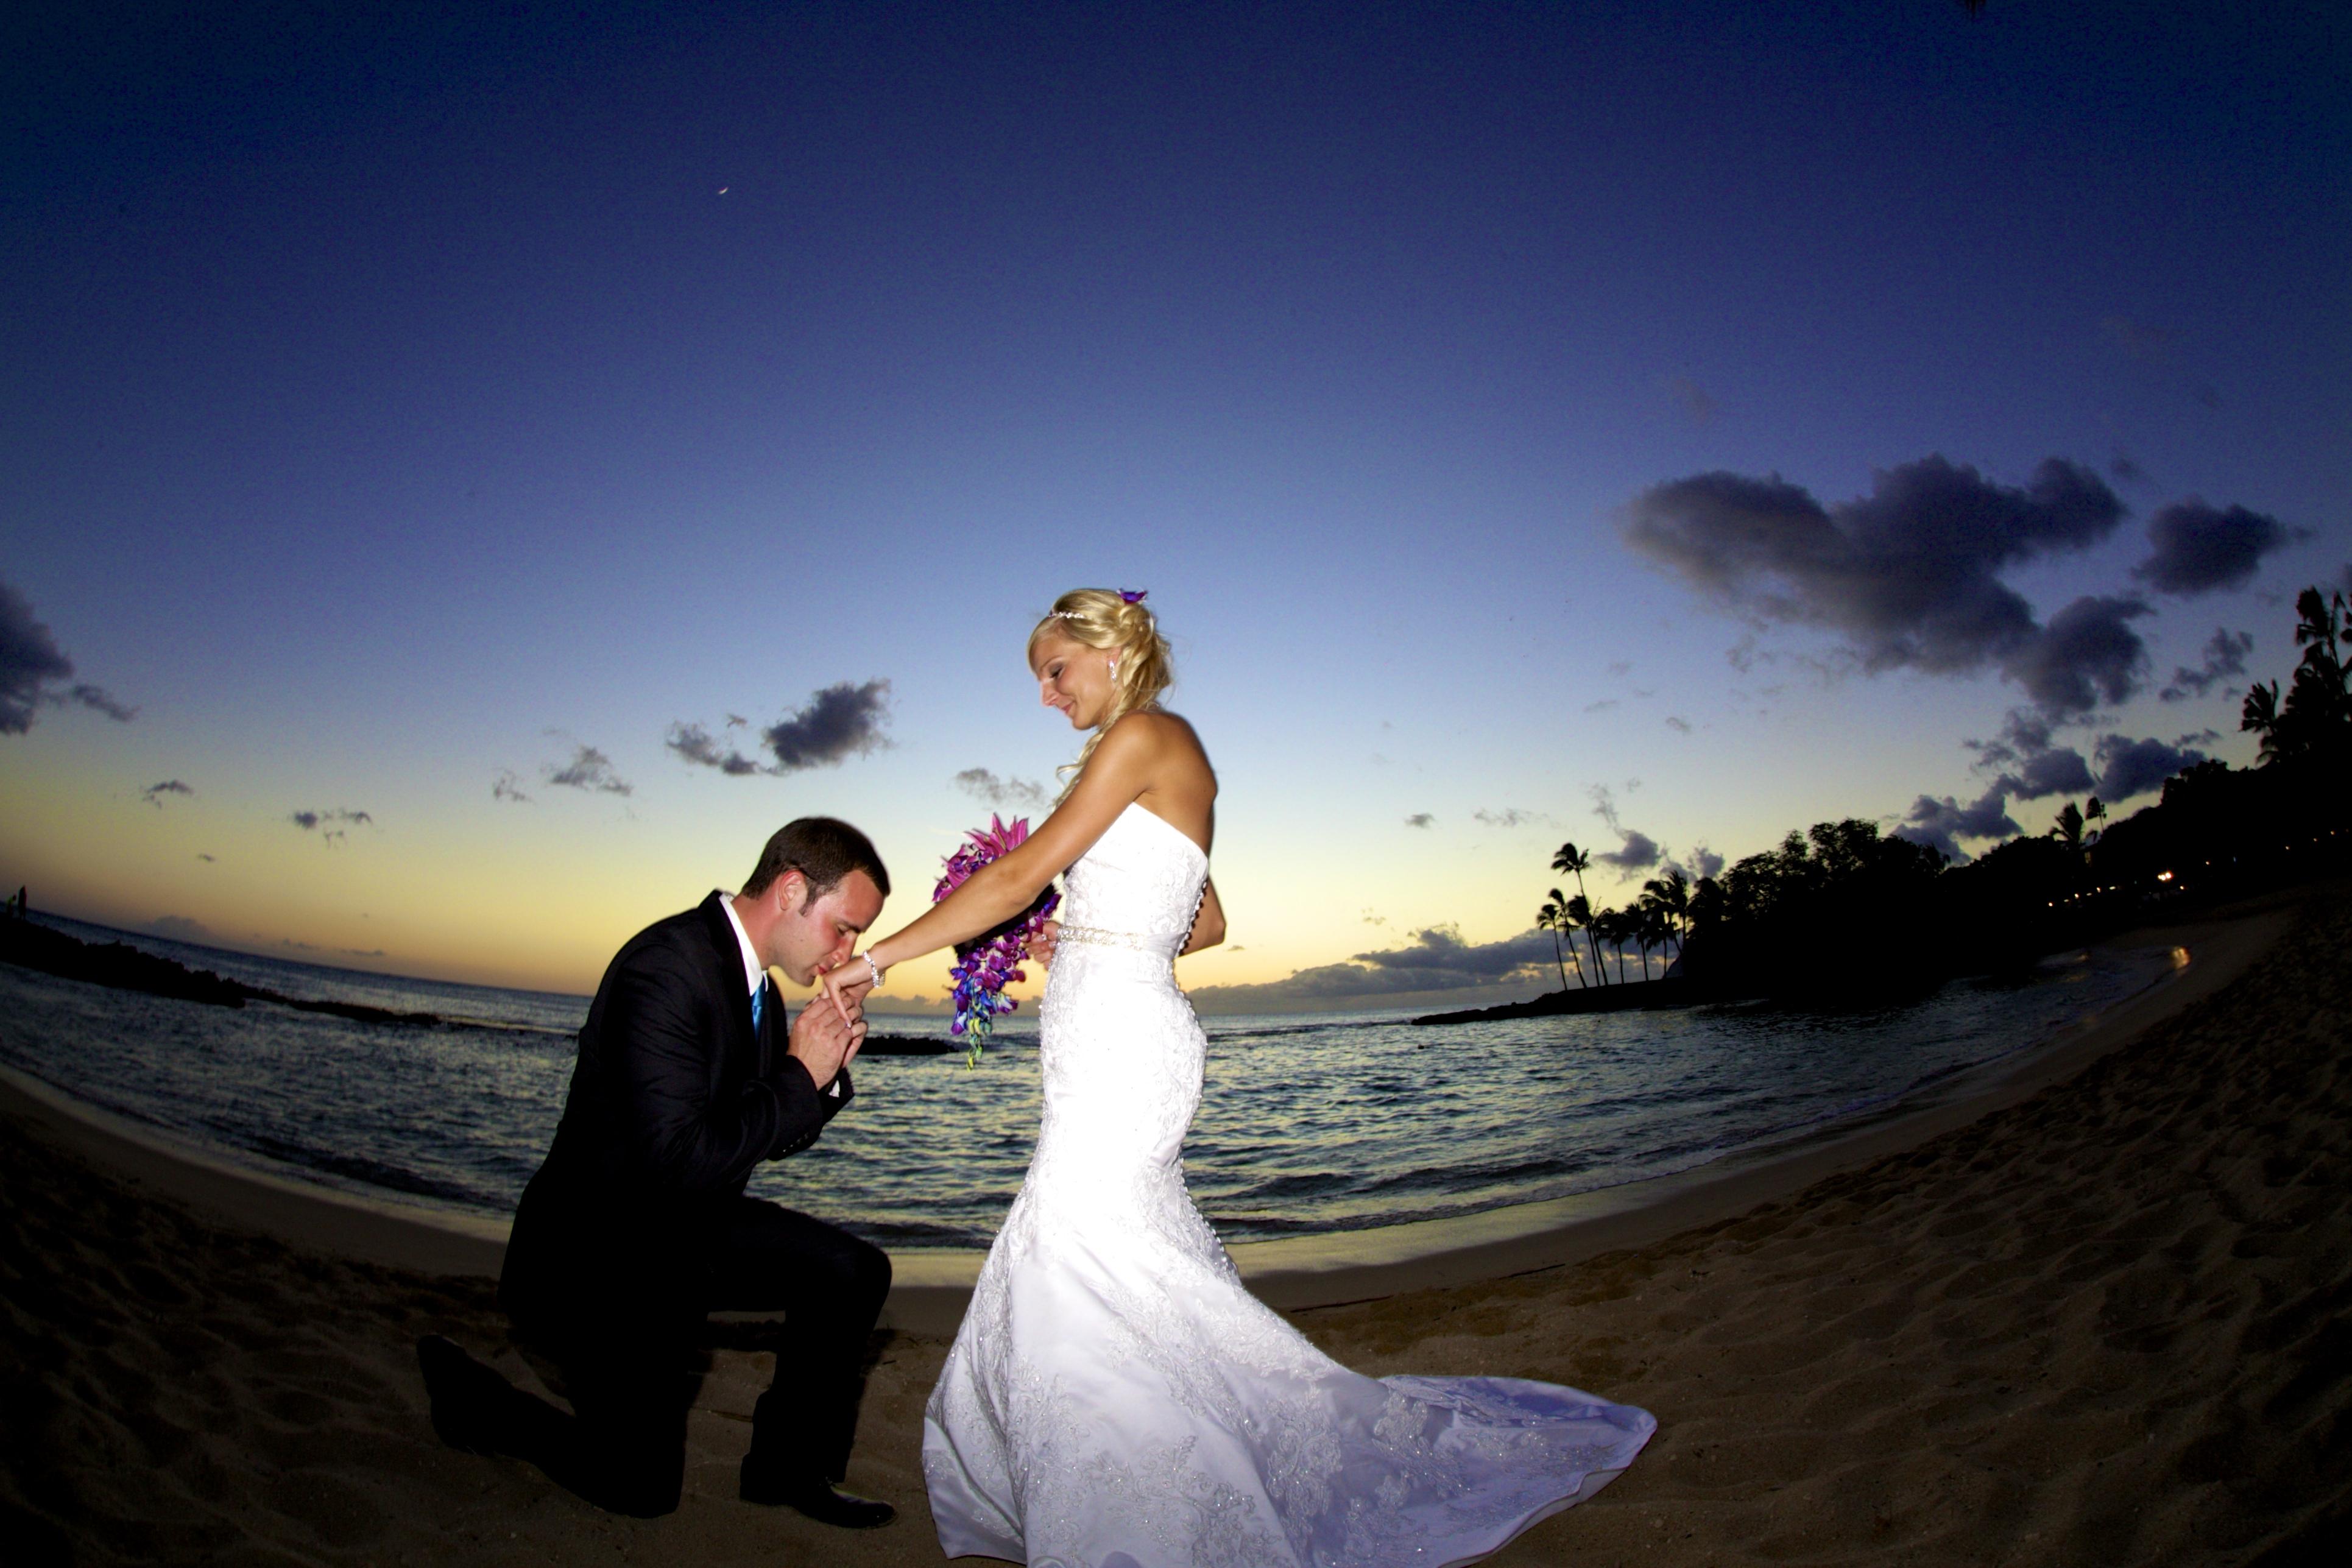 Sunset wedding photos in Hawaii 6